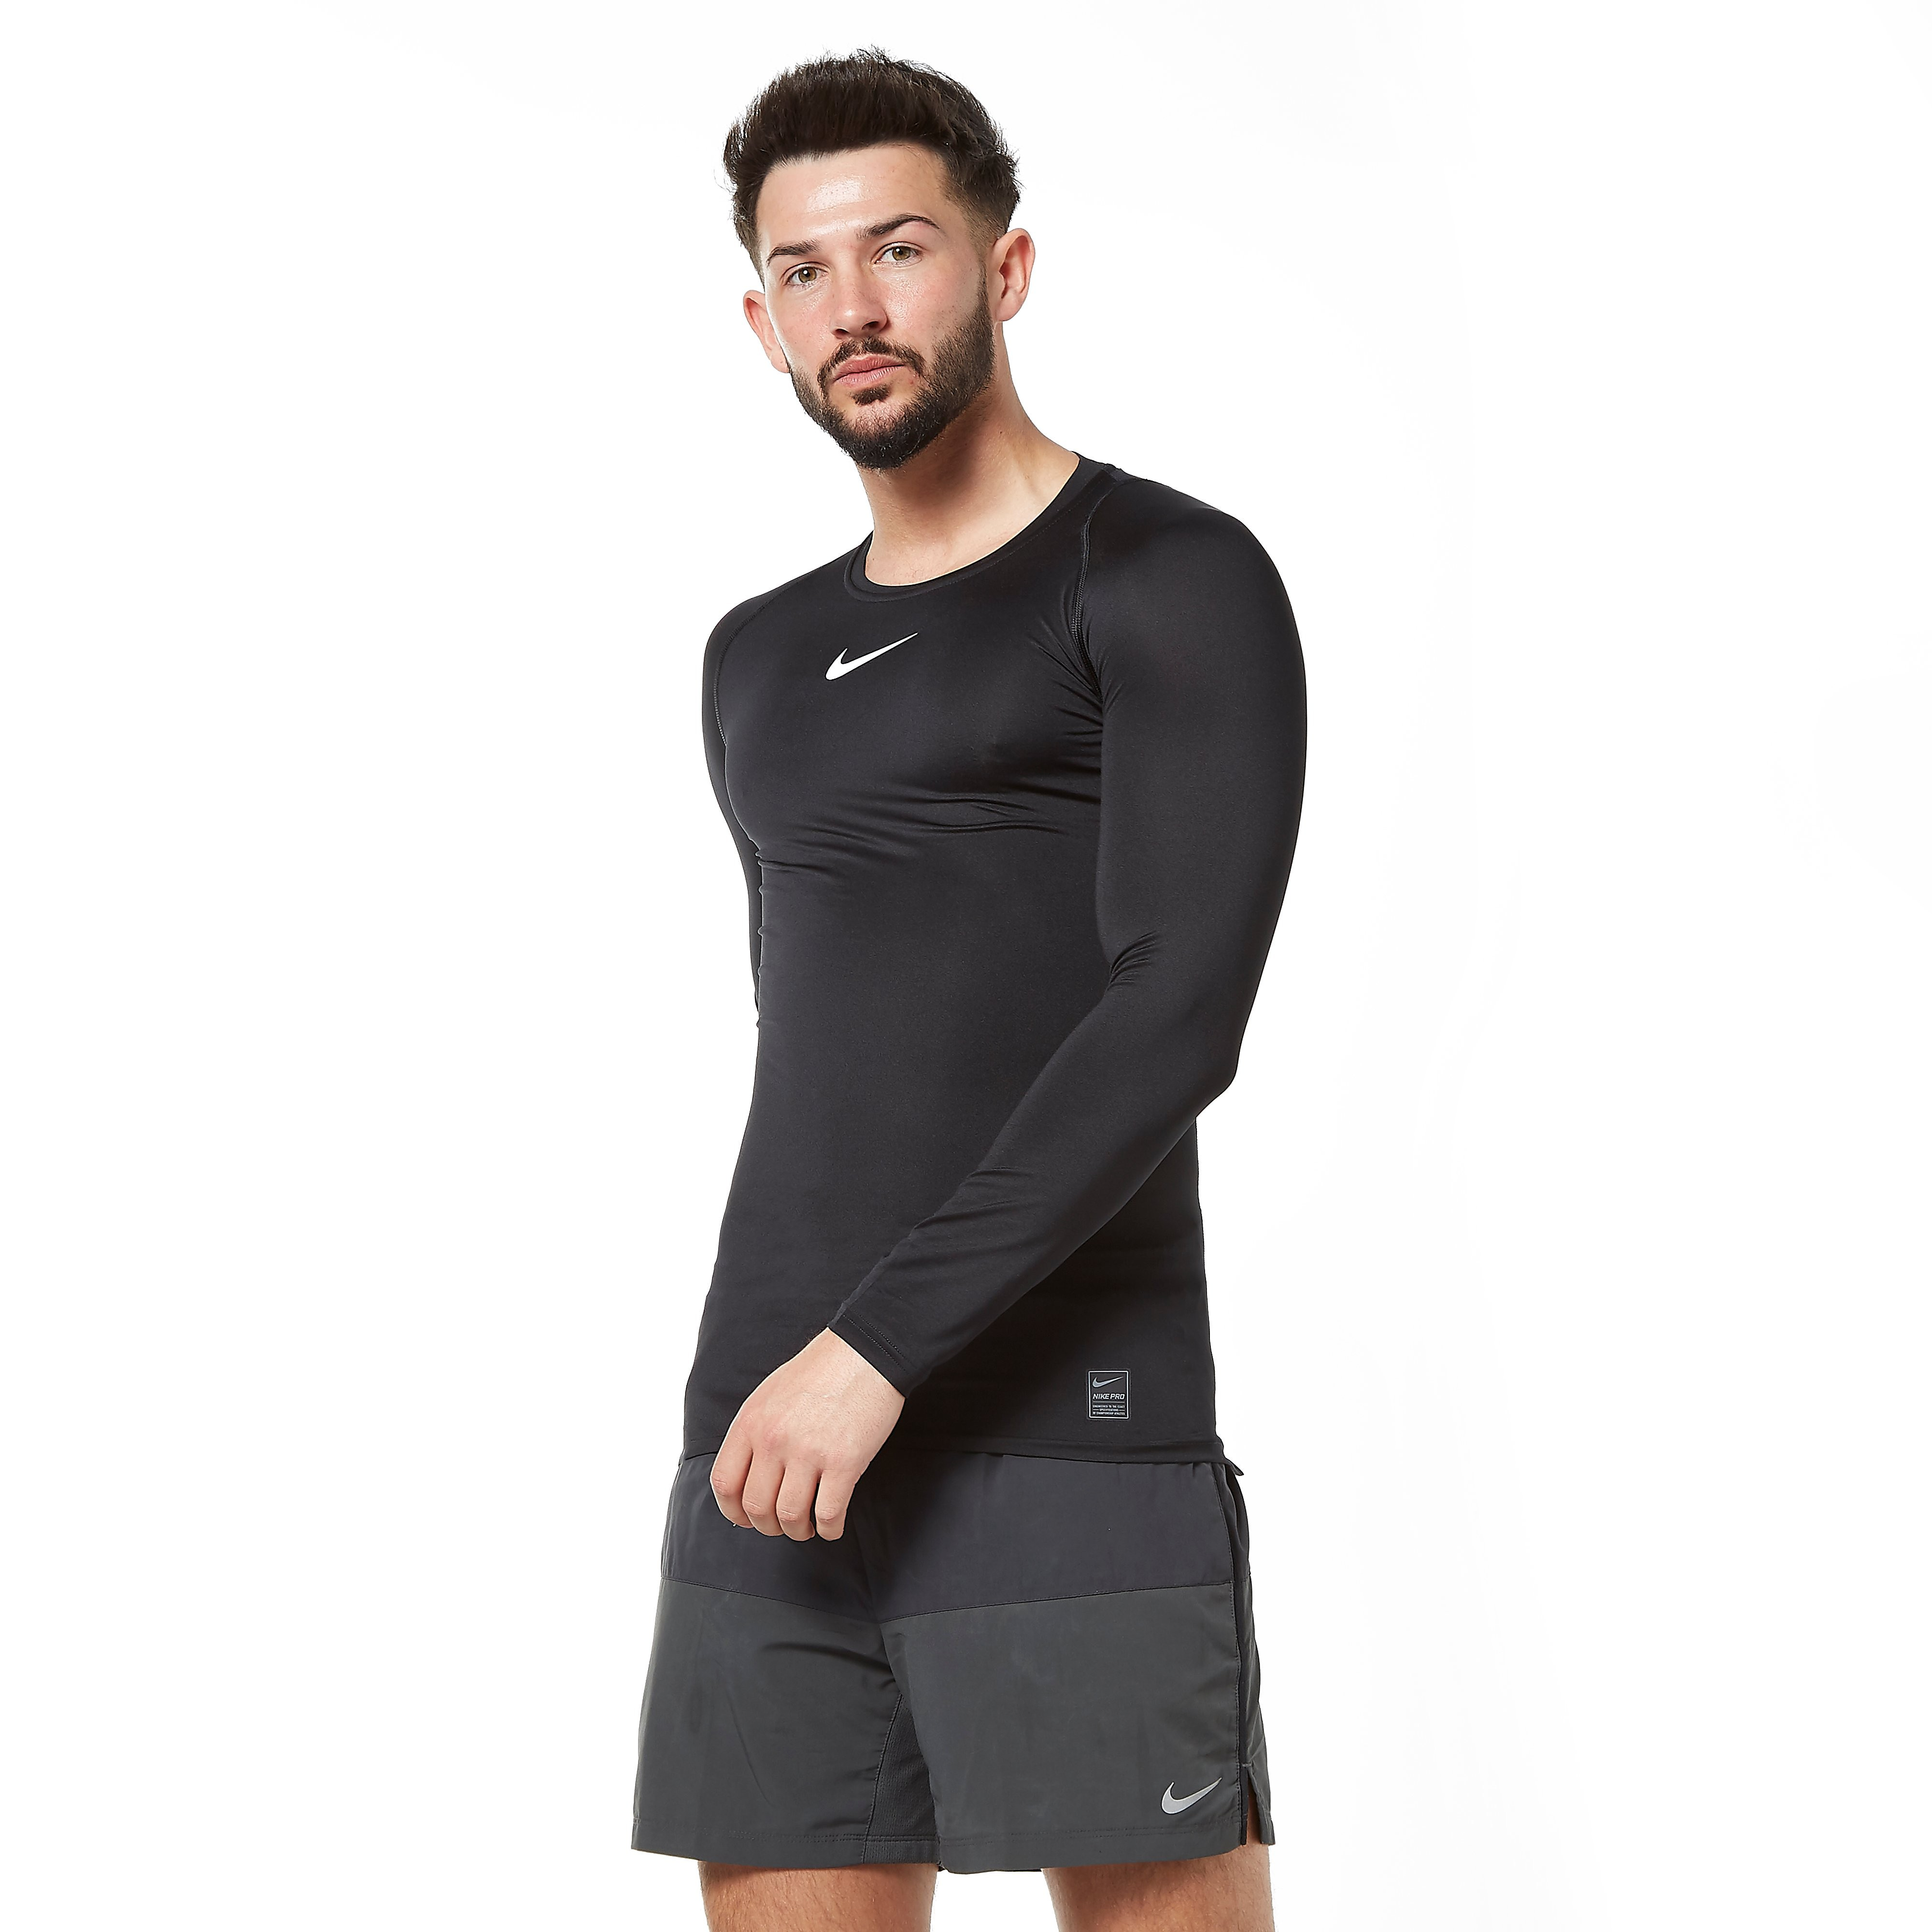 Nike Pro Long Sleeve Men's Compression T-Shirt